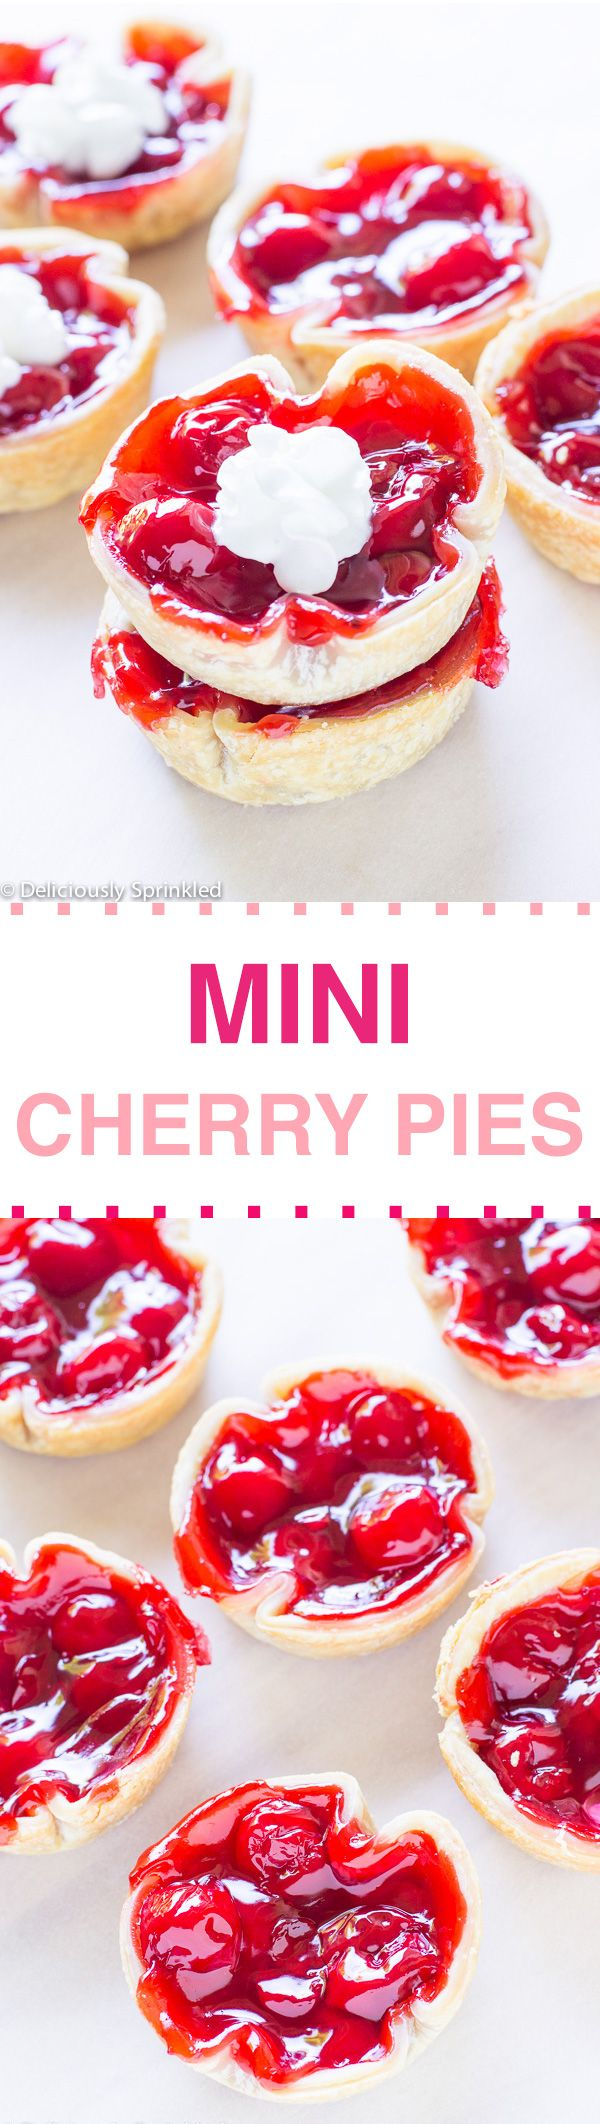 17 Best images about Pretzels, & Pastries, & Pies Oh My ...